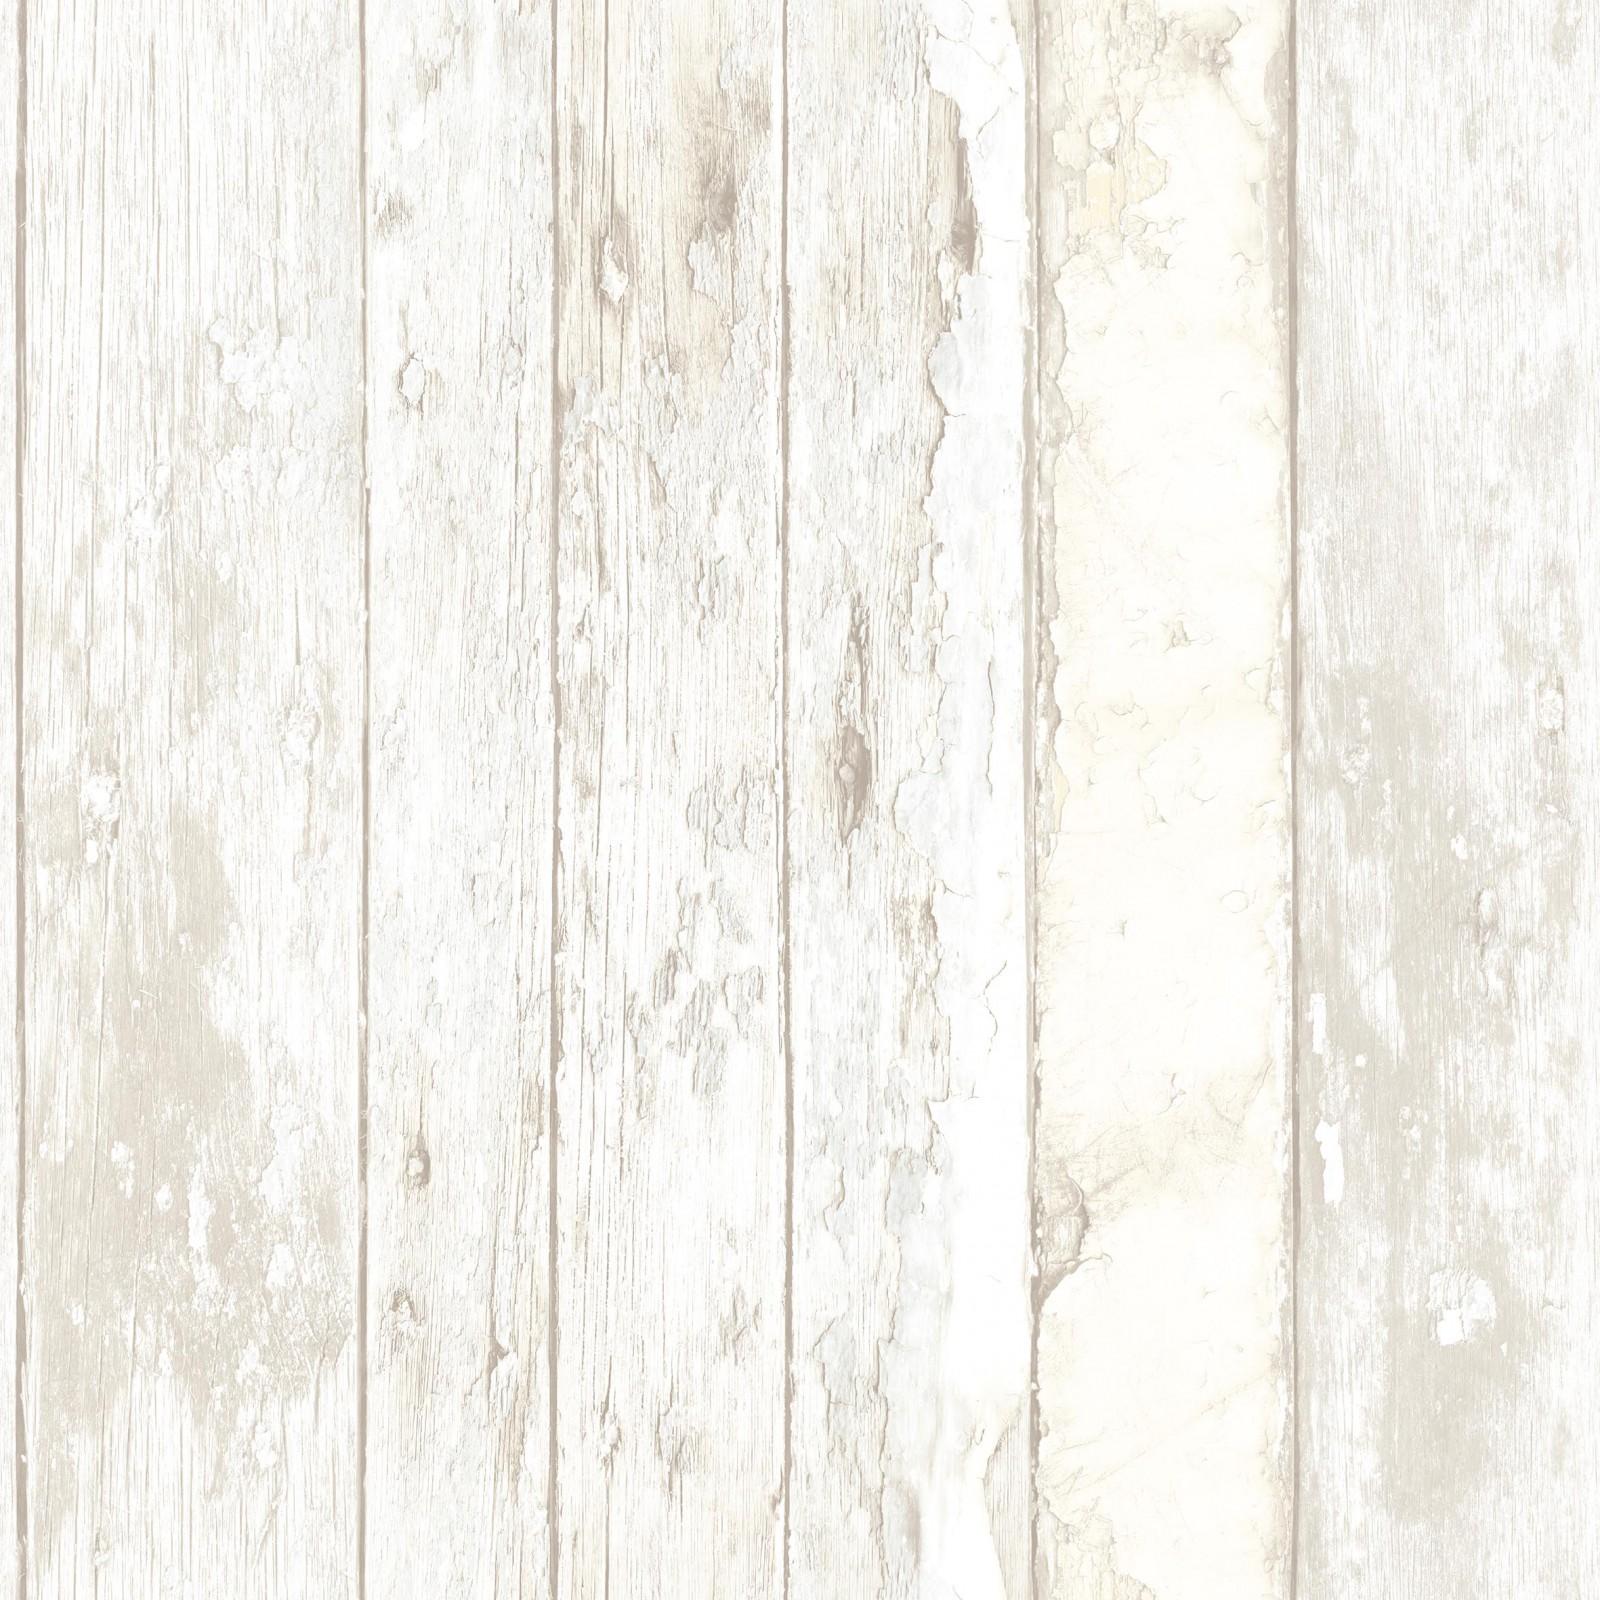 wallpaper grandeco exposed wood 3d white vintage shabby. Black Bedroom Furniture Sets. Home Design Ideas